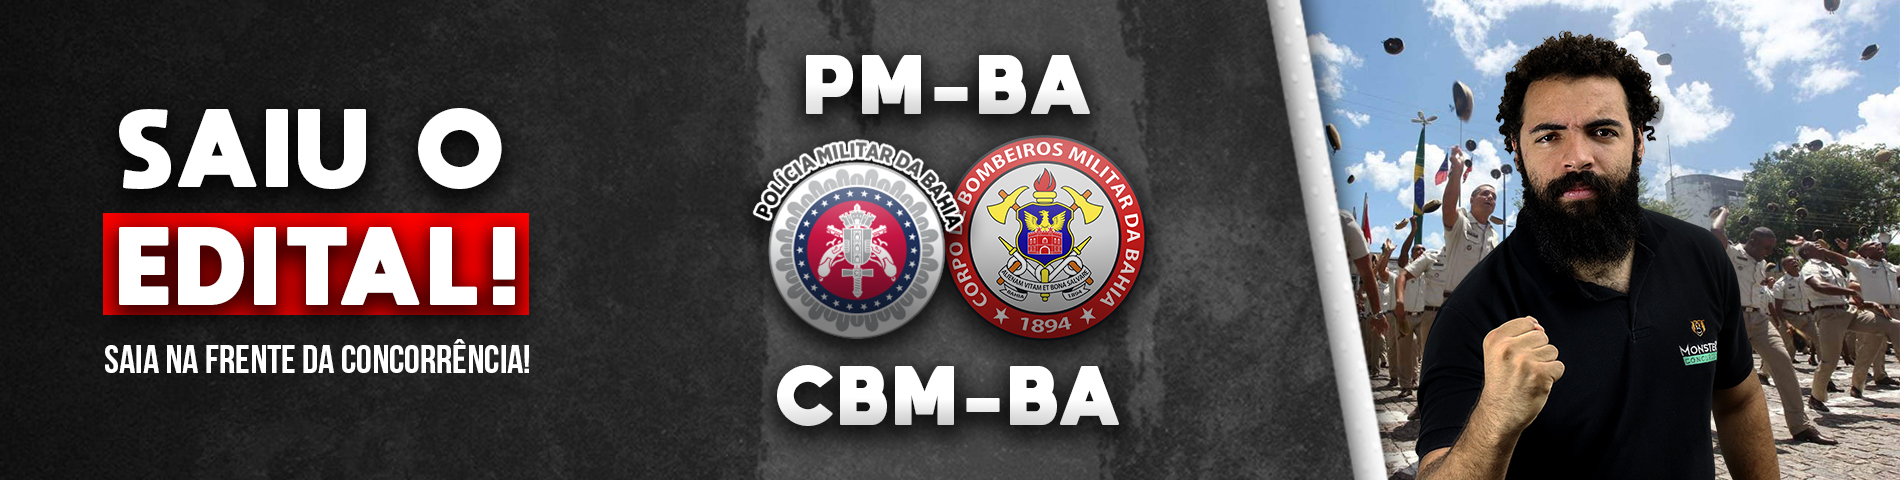 Abriu edital - Policia militar da bahia e corpo de bombeiros da bahia